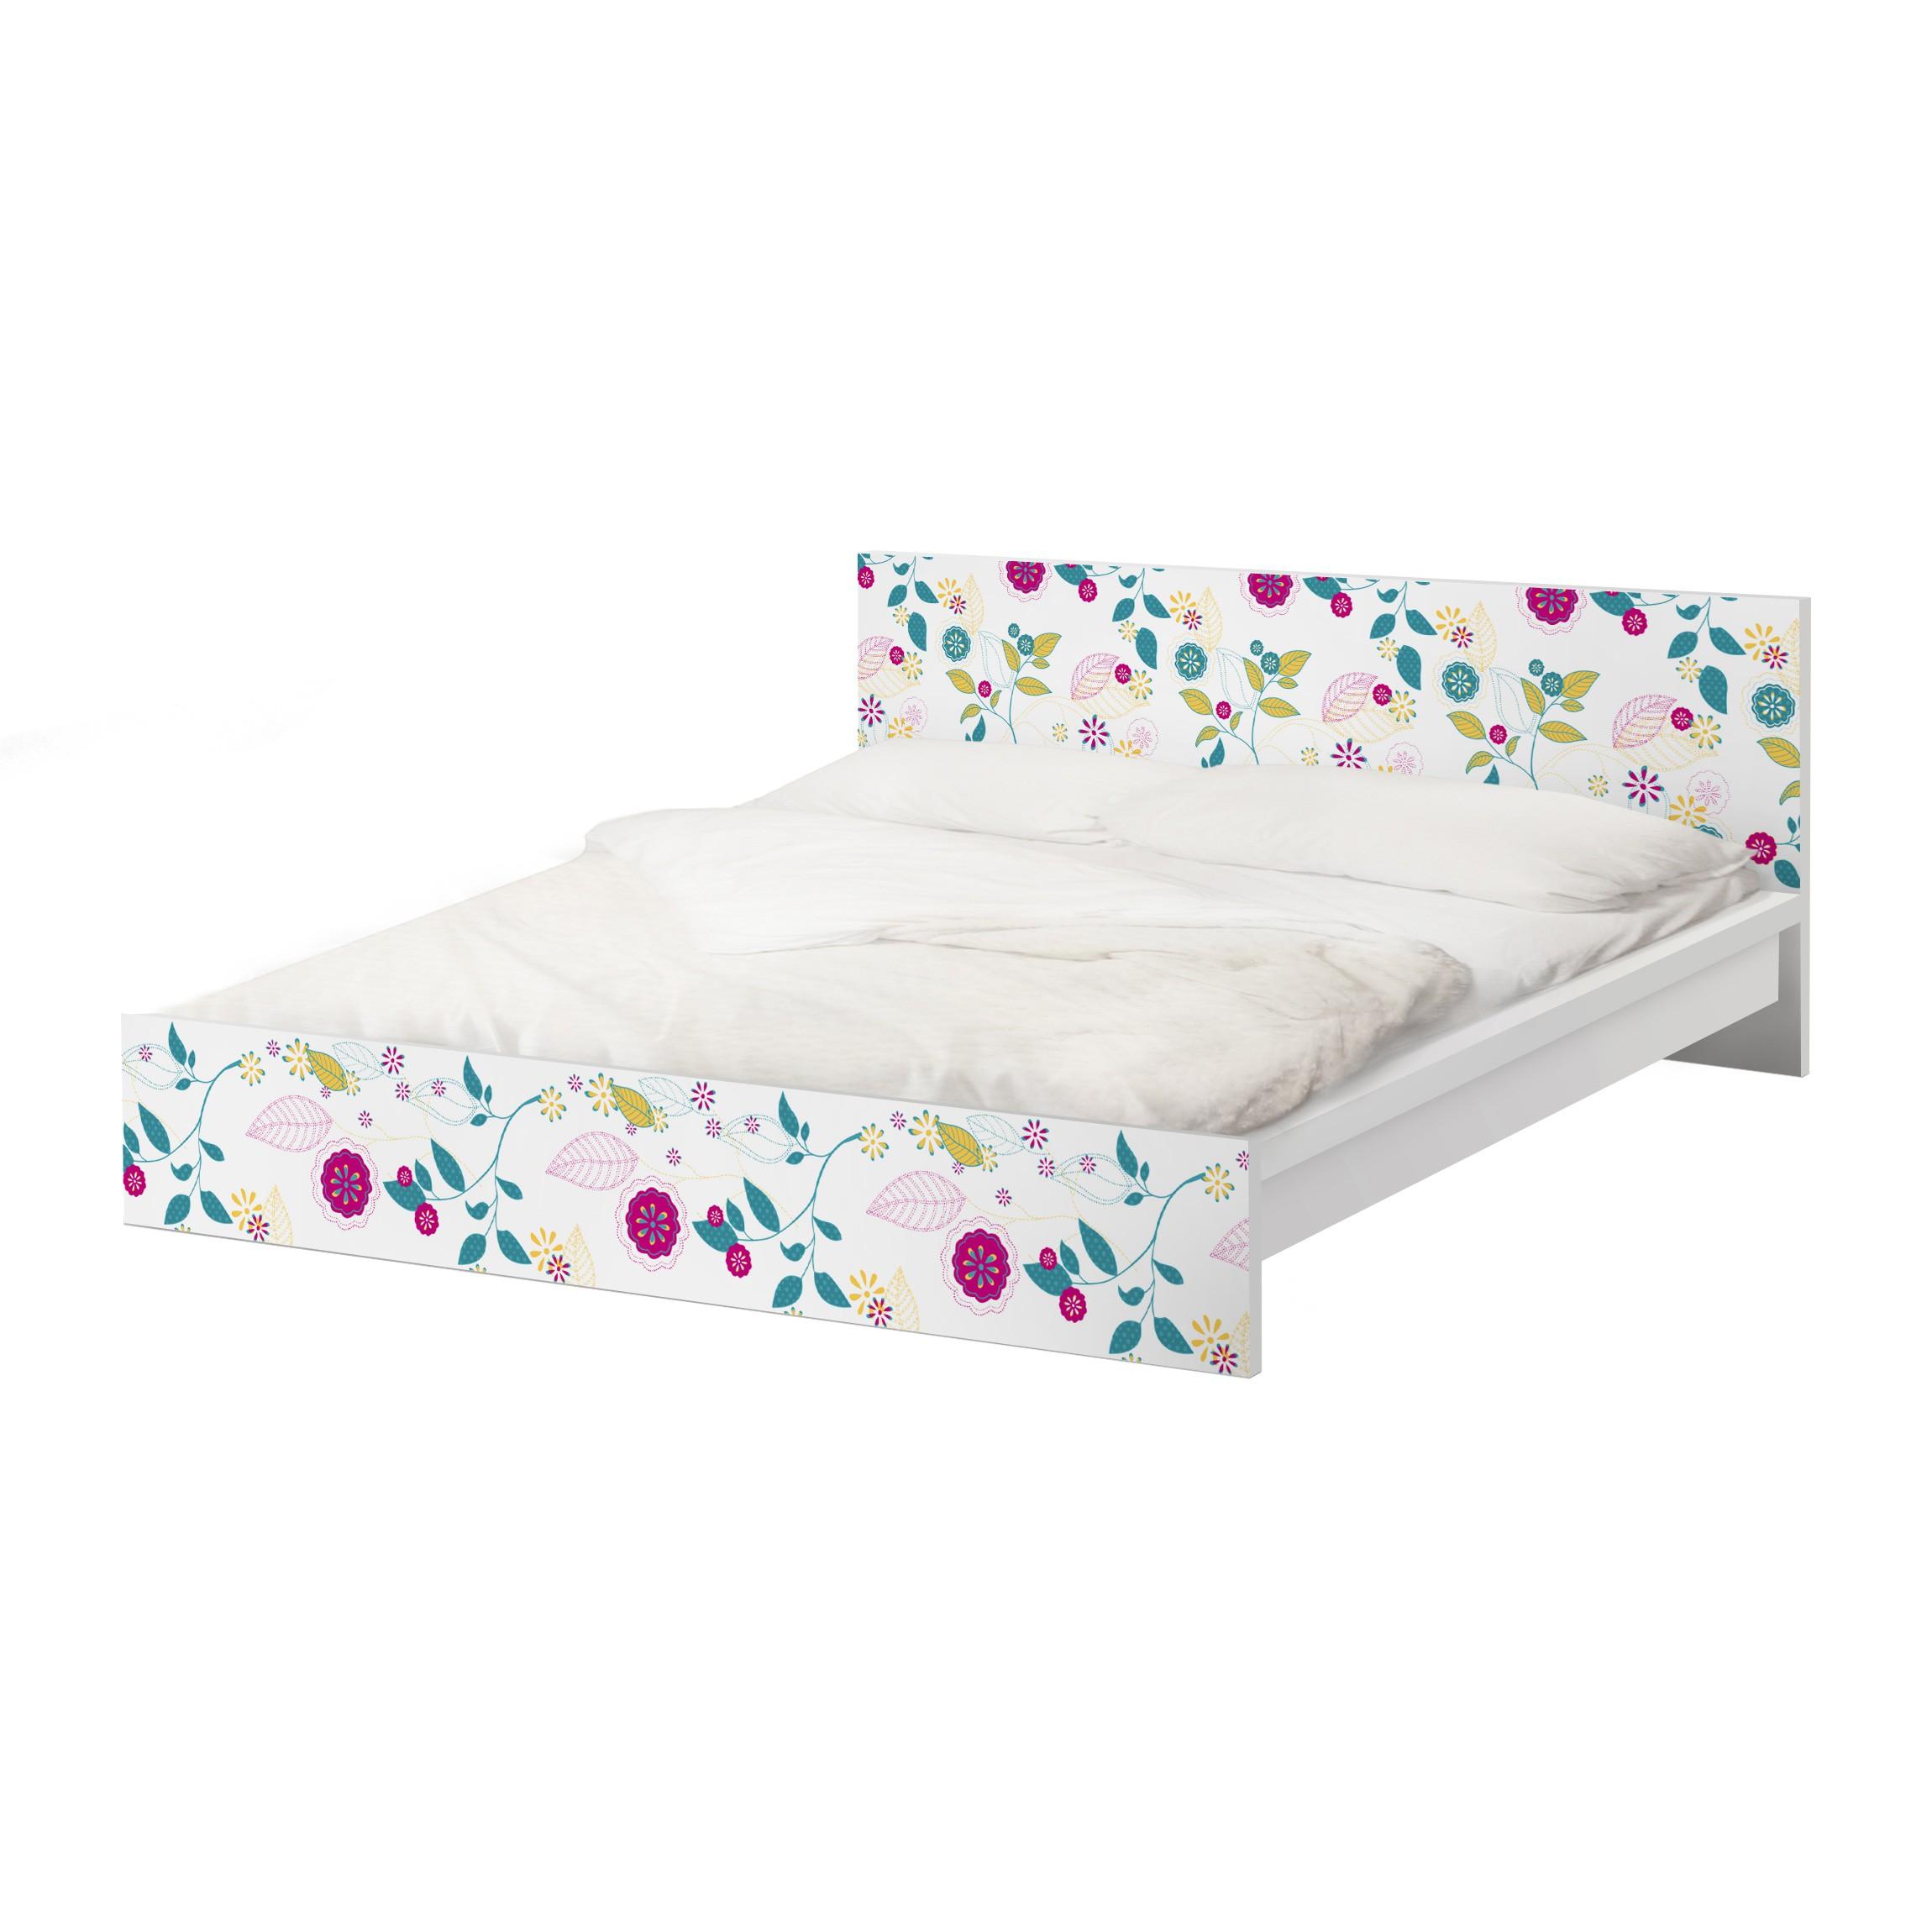 m belfolie f r ikea malm bett niedrig 180x200cm klebefolie blumencocktail. Black Bedroom Furniture Sets. Home Design Ideas